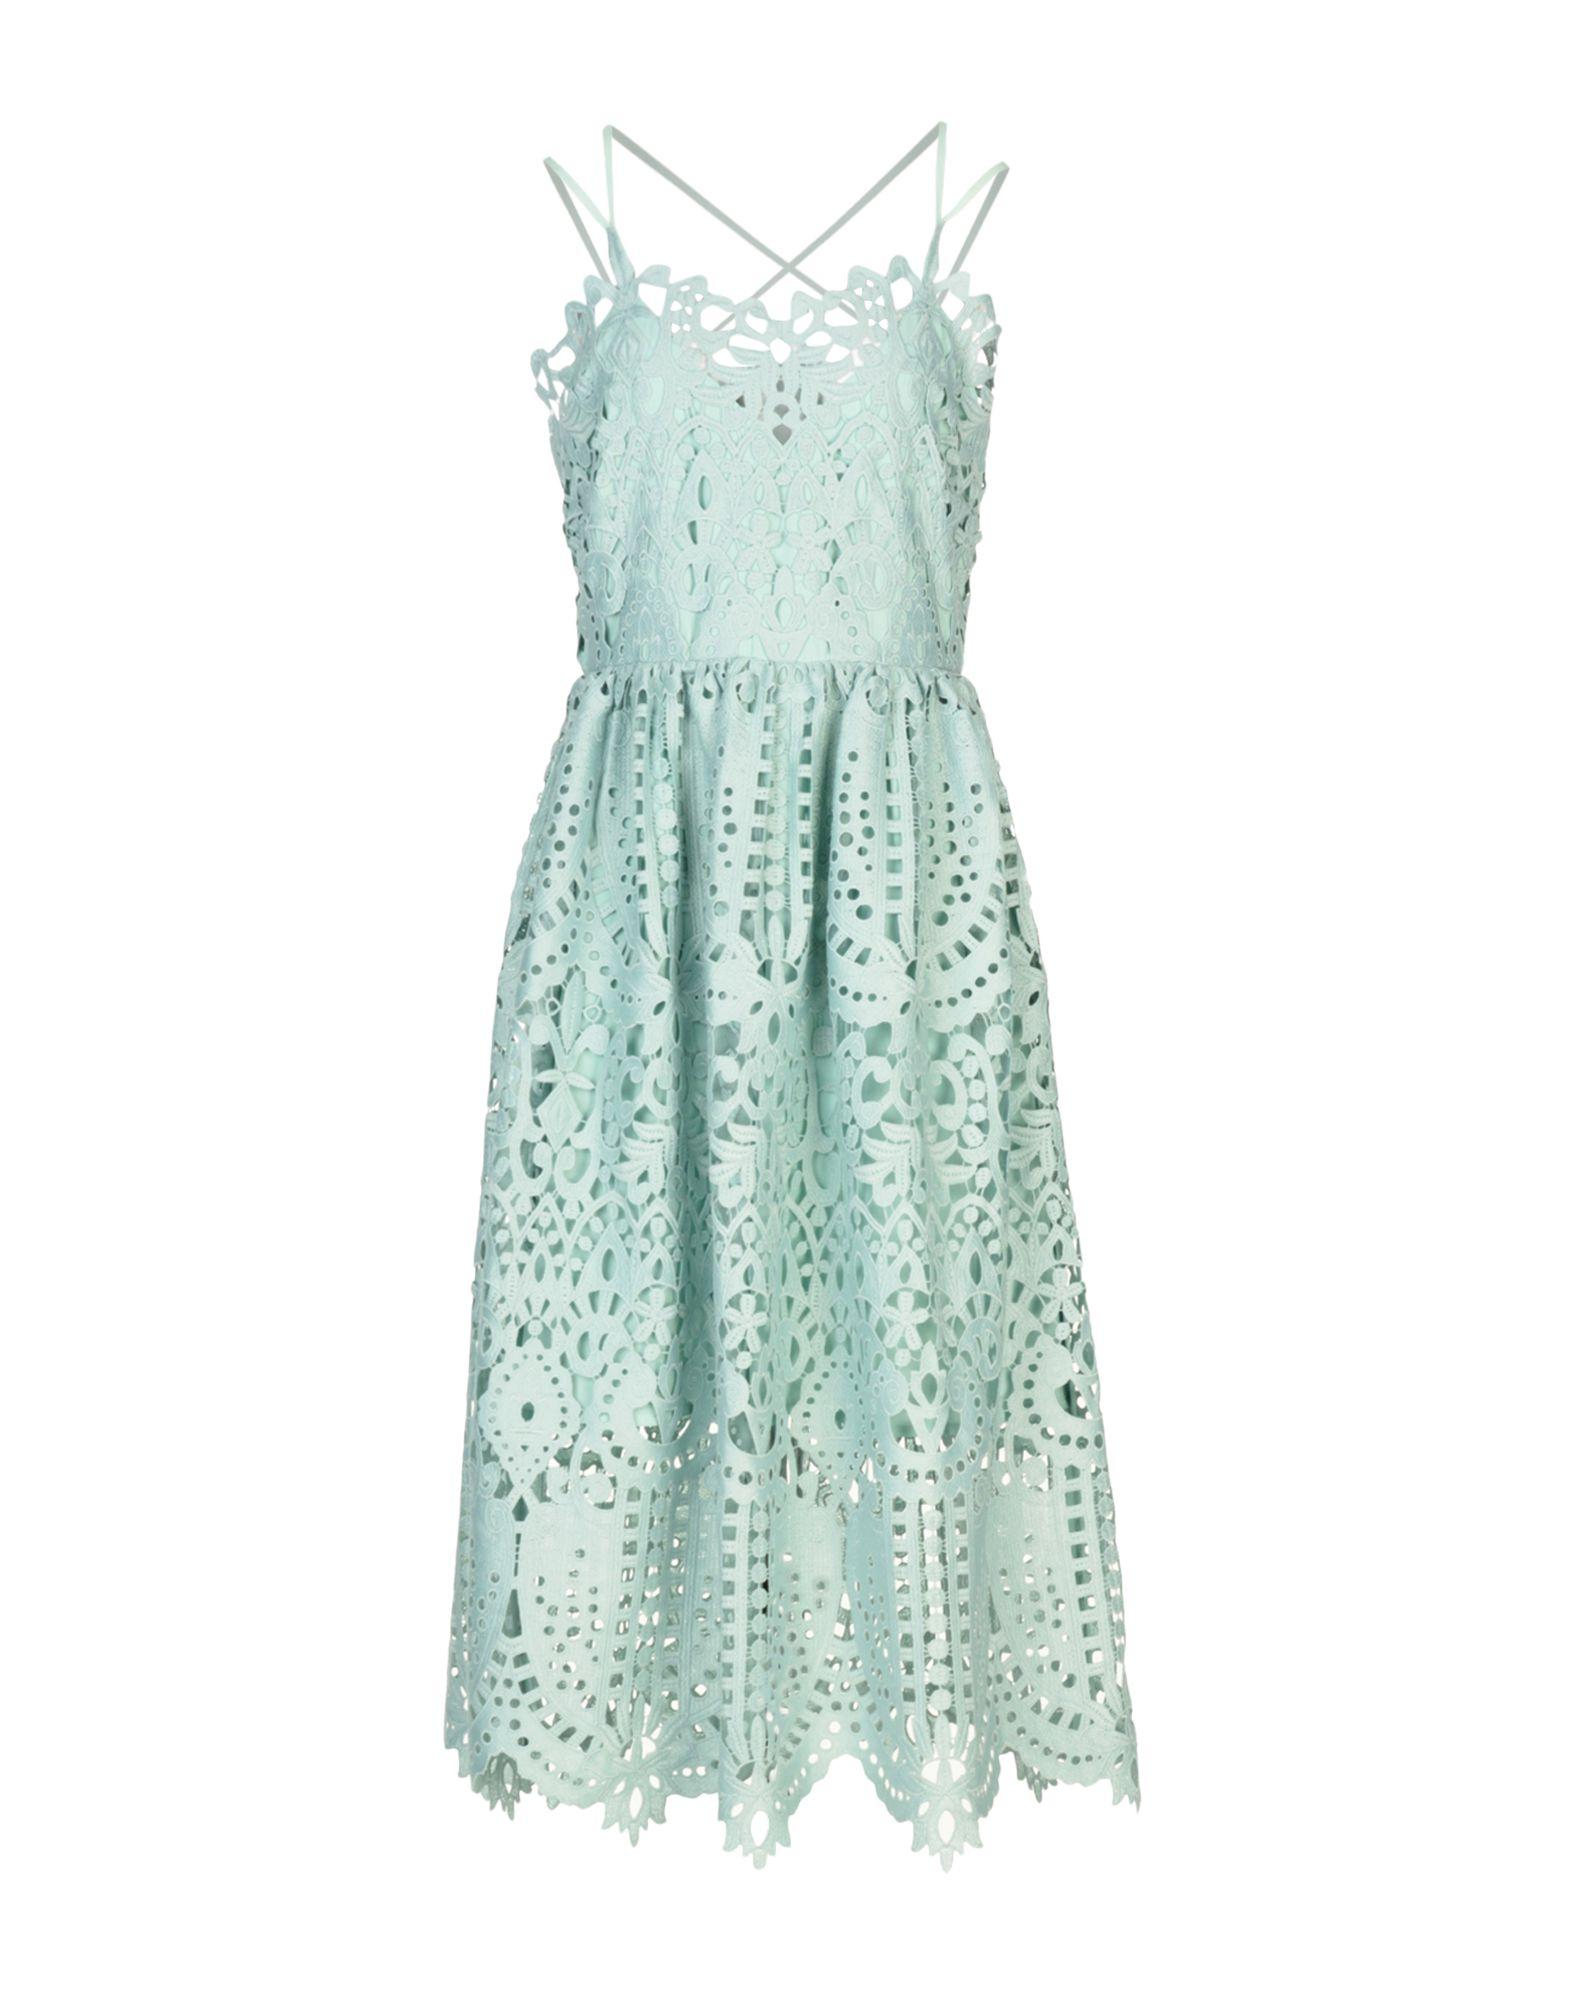 PERSEVERANCE Midi Dress in Sky Blue